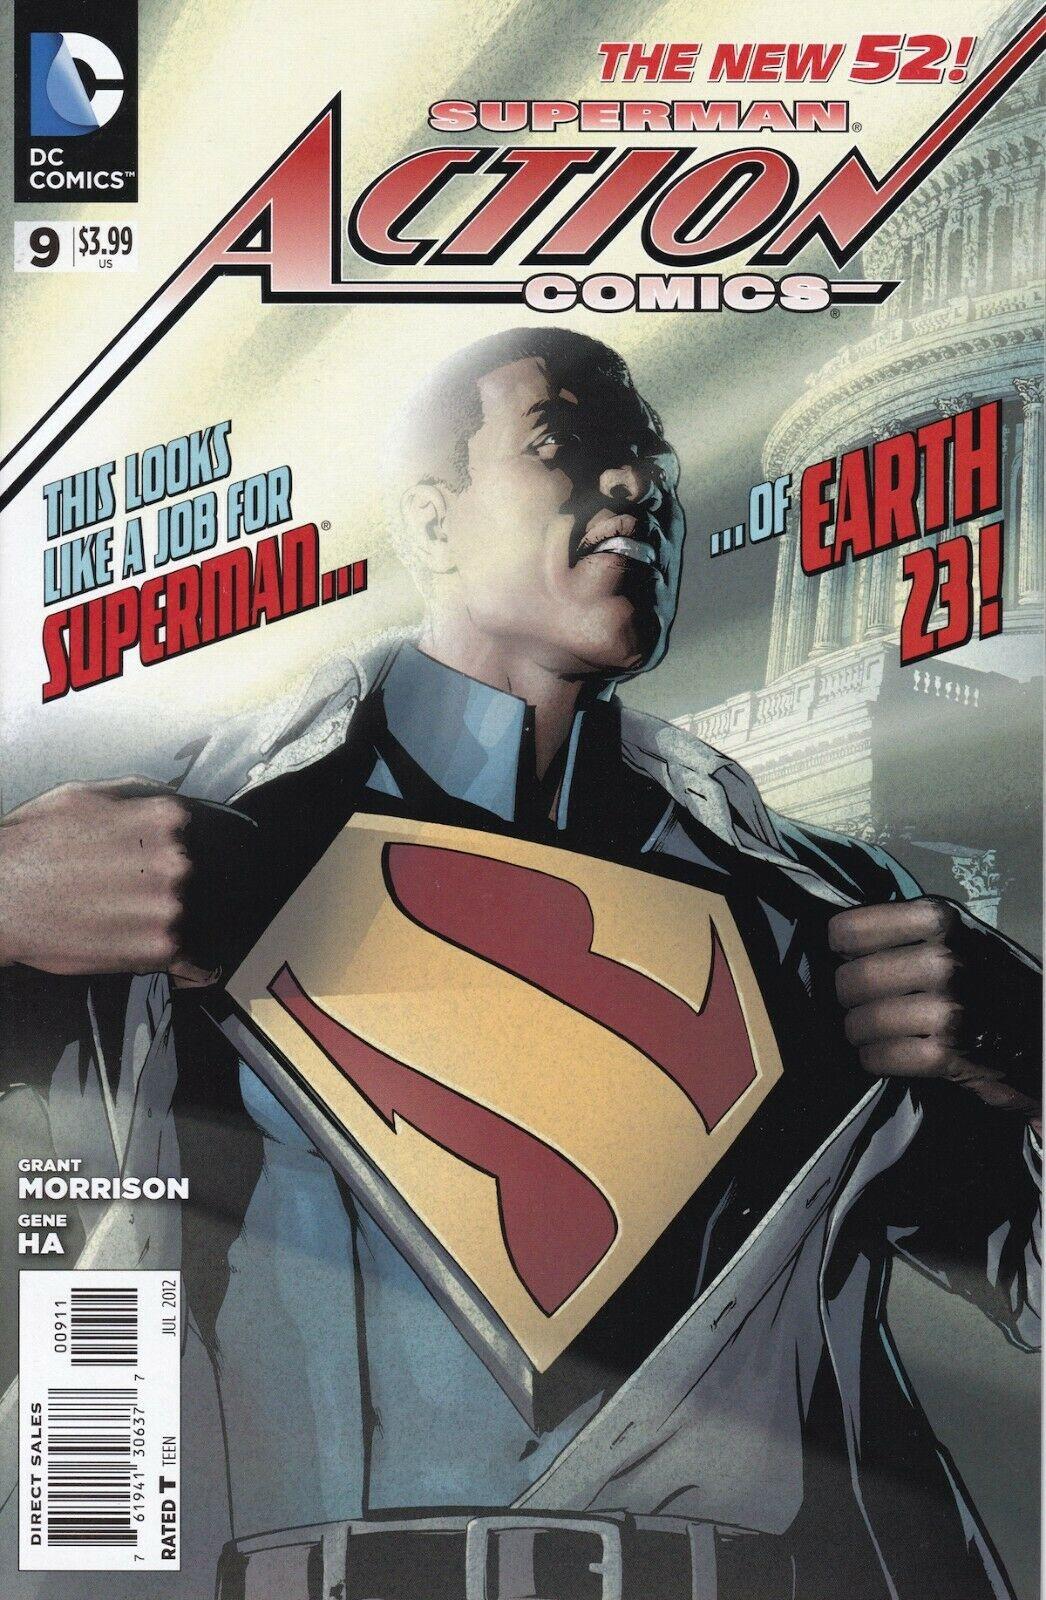 Action Comics #9 (2012)